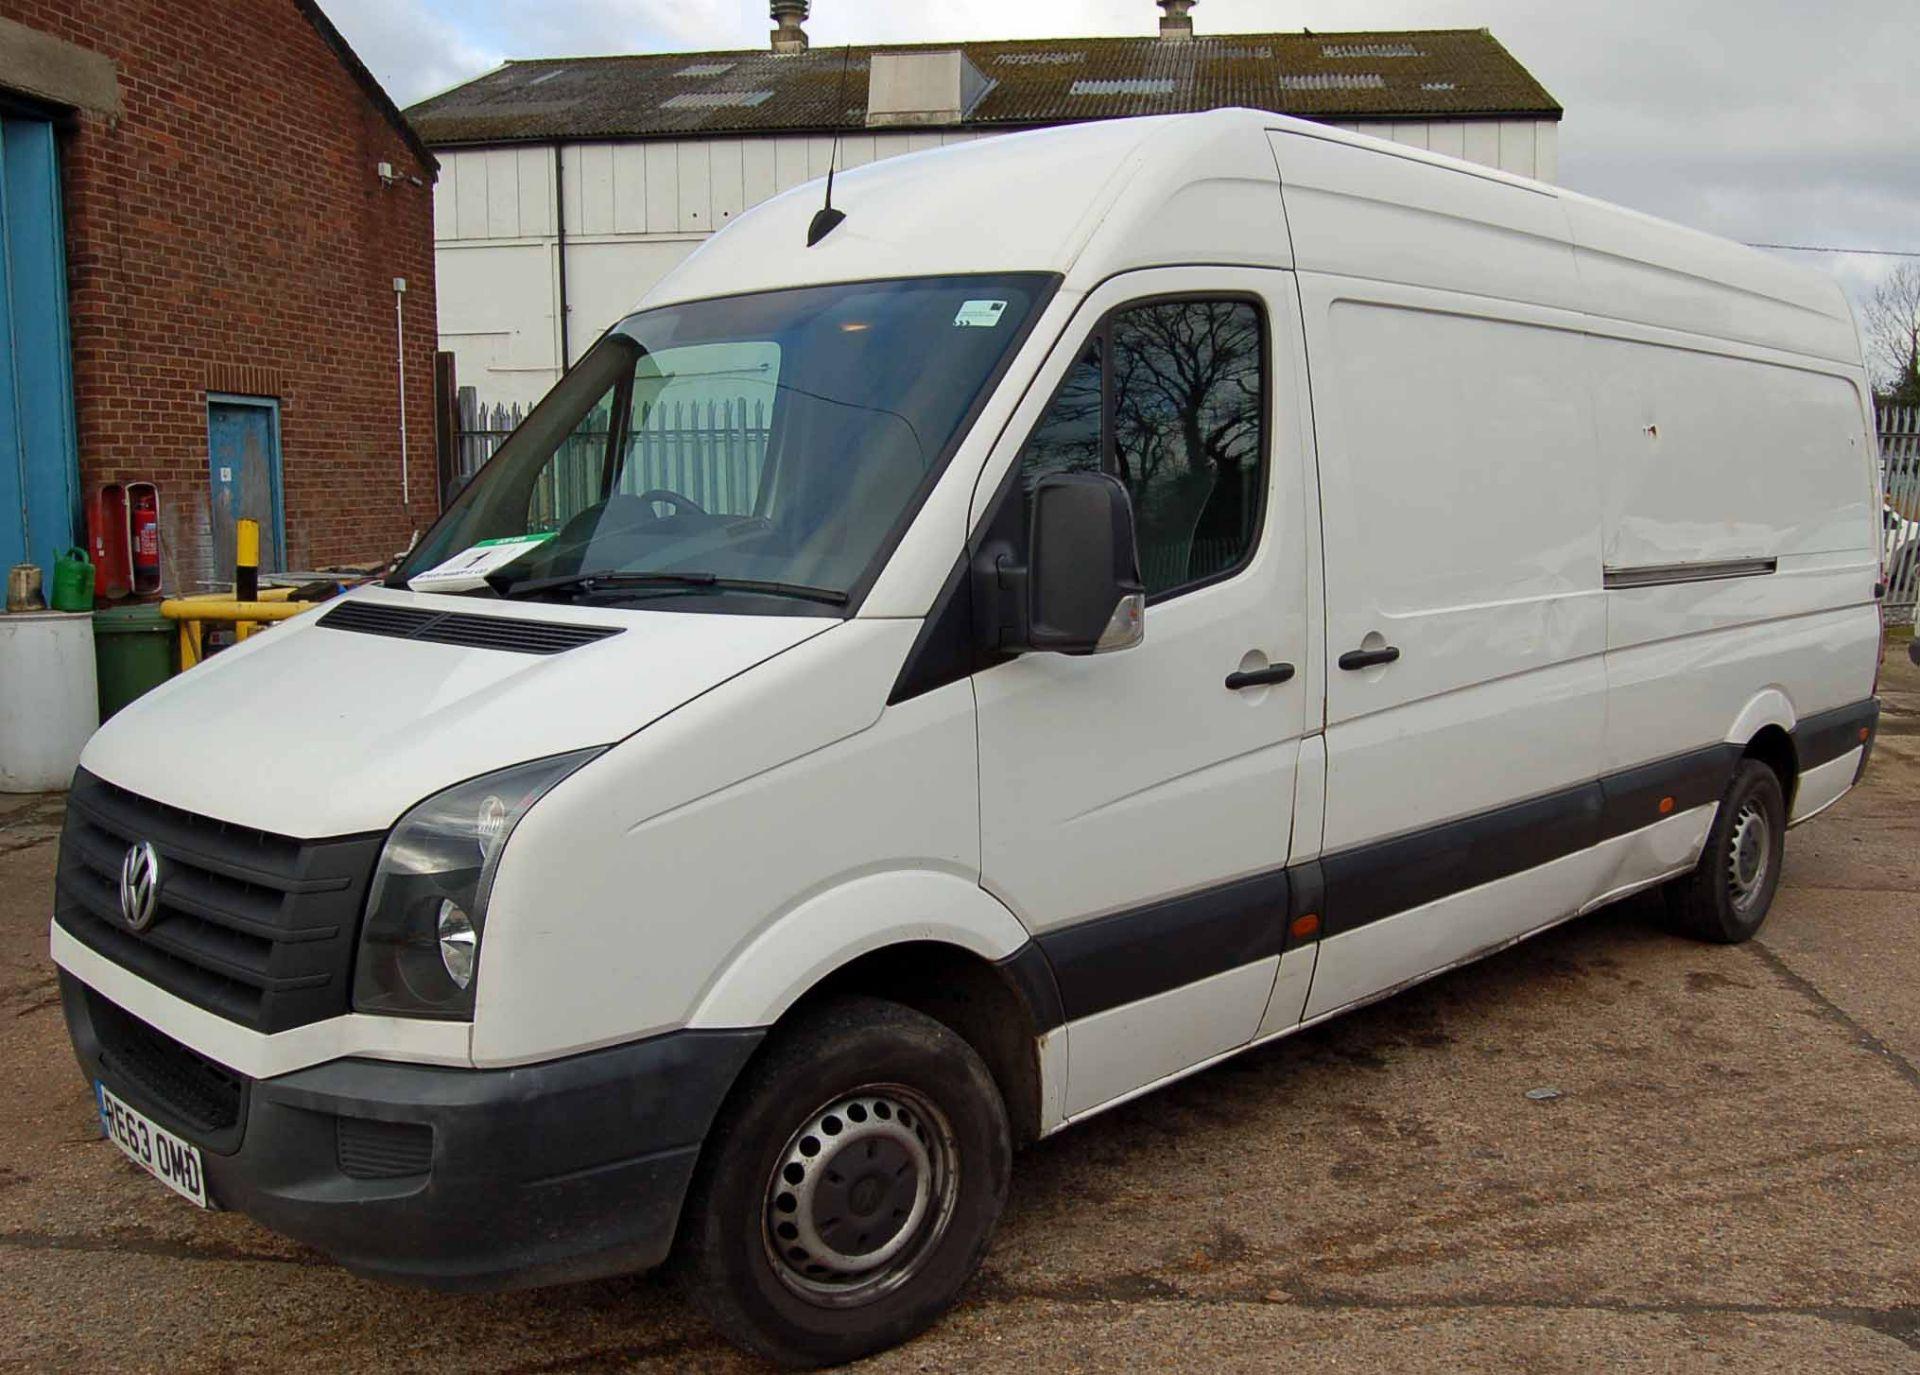 Lot 1 - A VOLKSWAGEN Crafter CR35 109 2.0 TDi Bluemotion, 6-Speed, Diesel Panel Van, Registration No. RE63